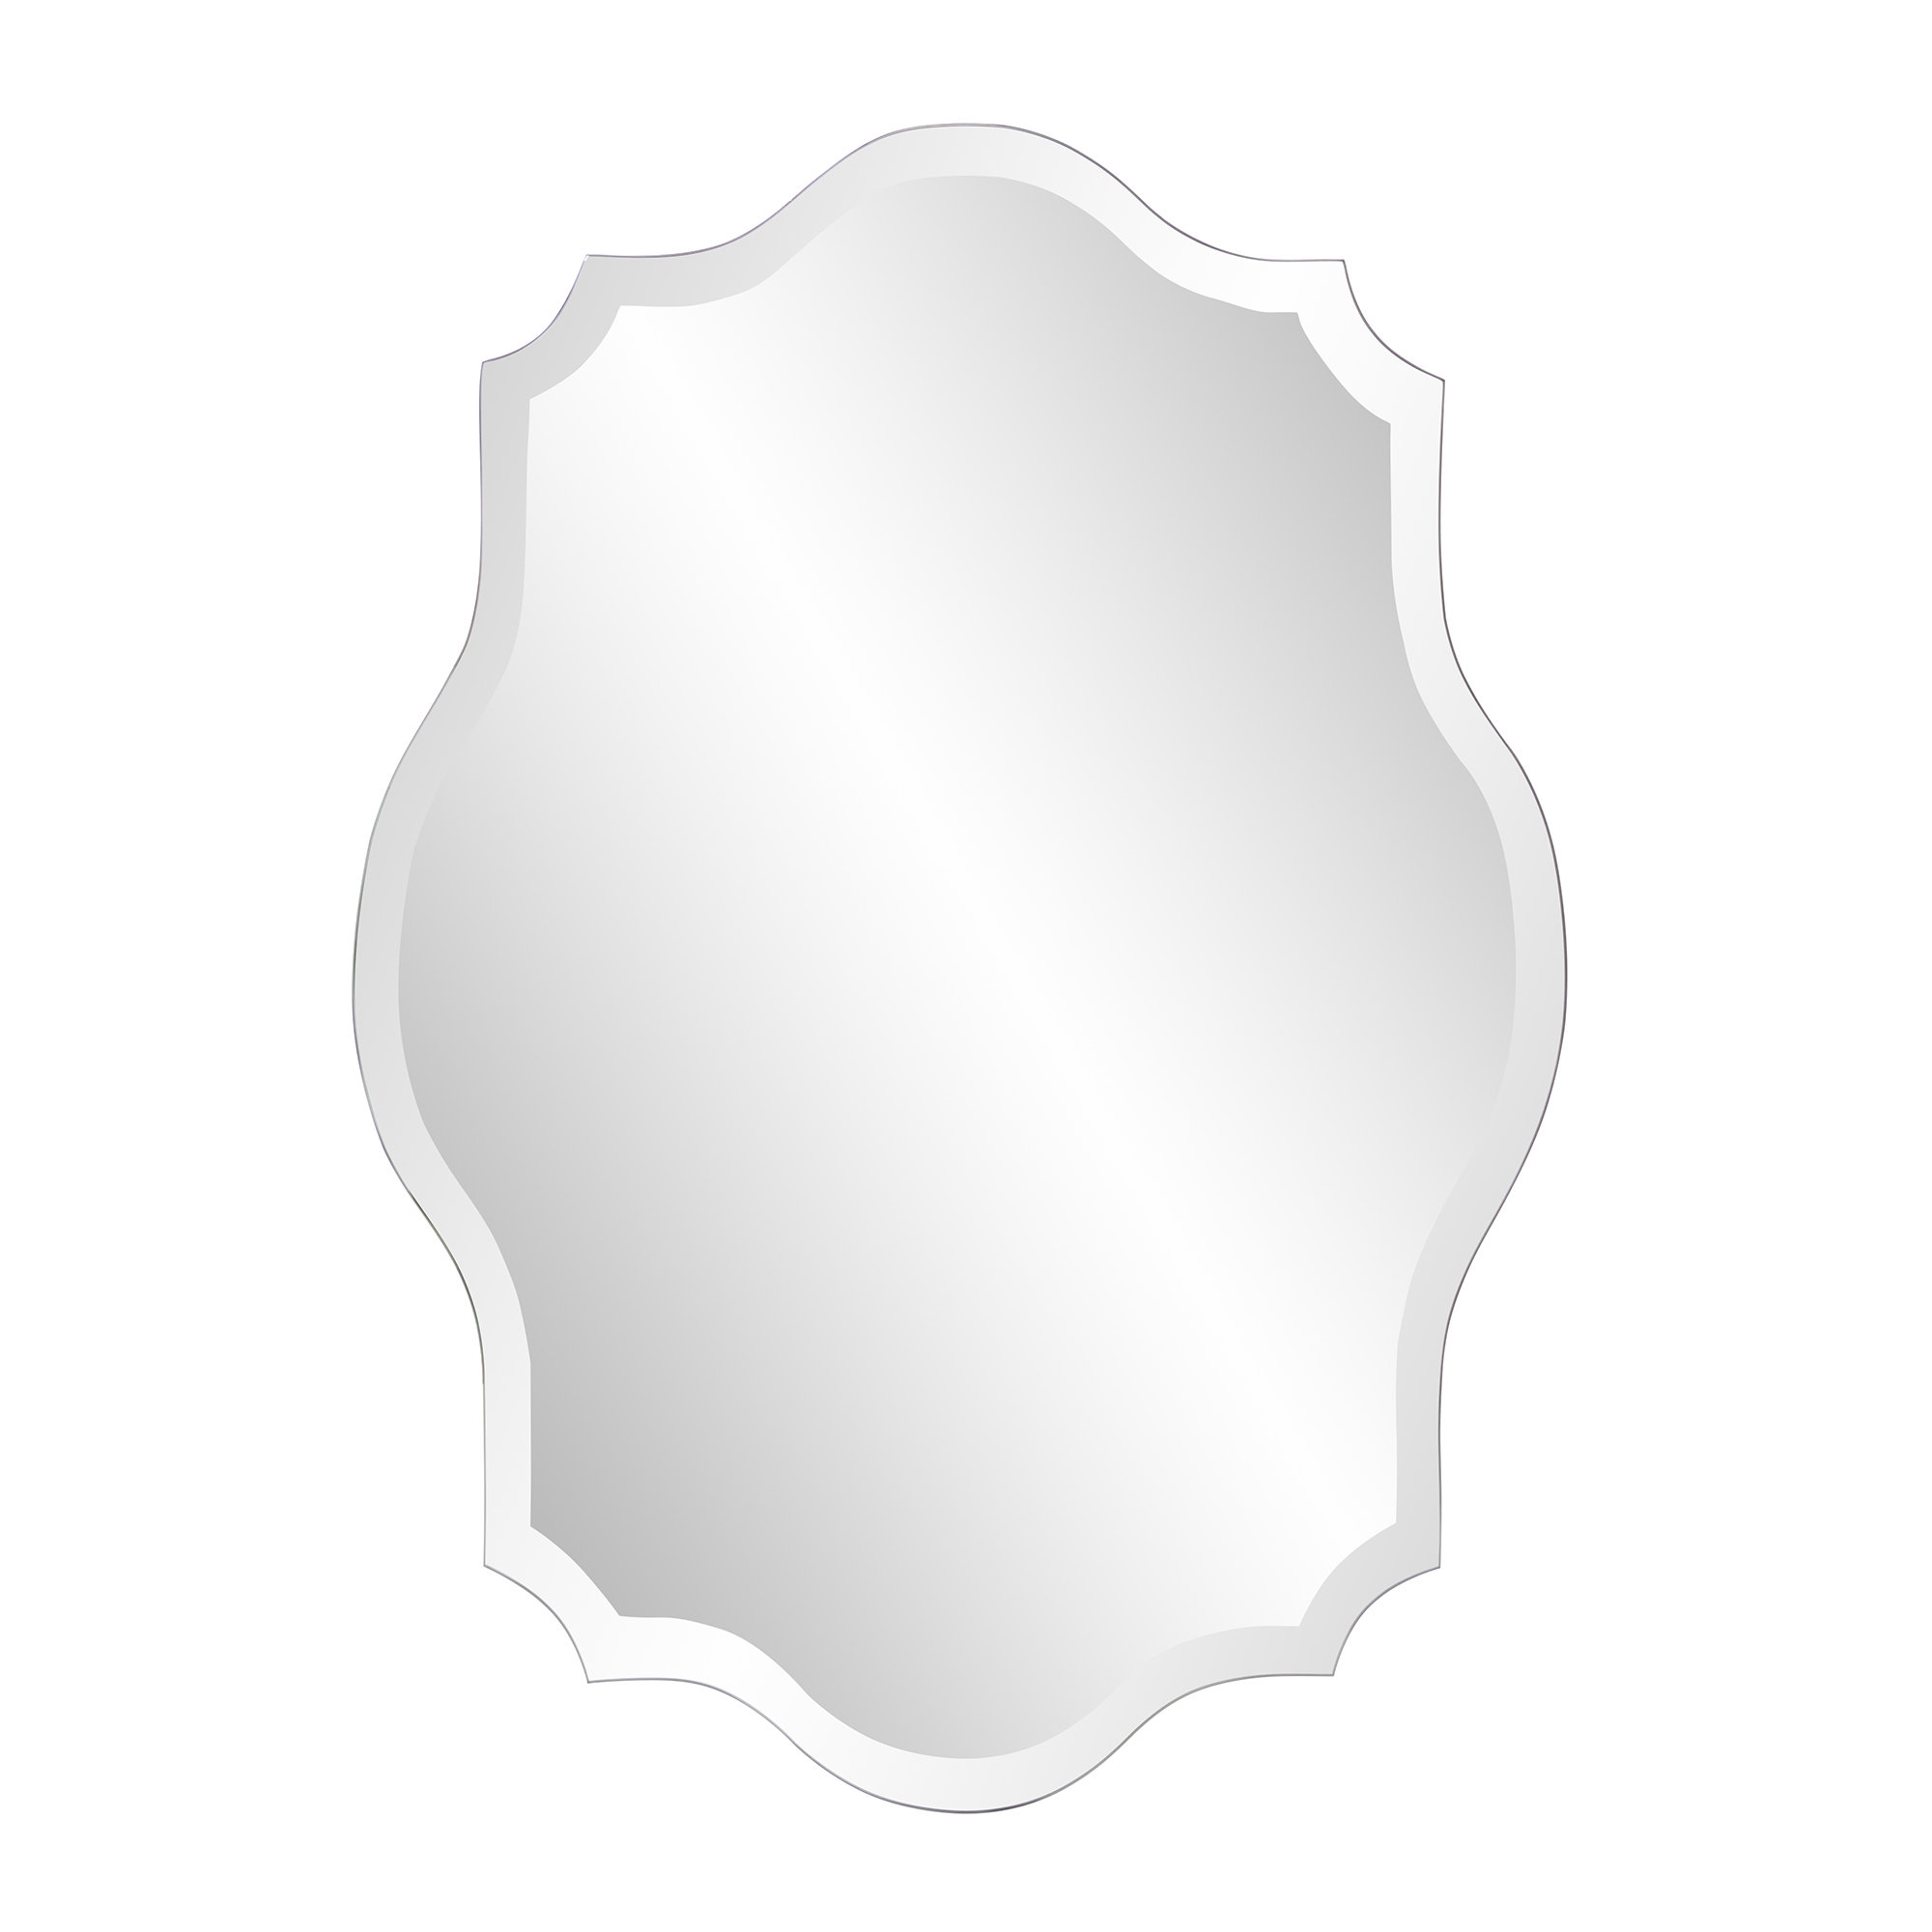 Guidinha Modern & Contemporary Accent Mirror In Guidinha Modern & Contemporary Accent Mirrors (View 3 of 30)